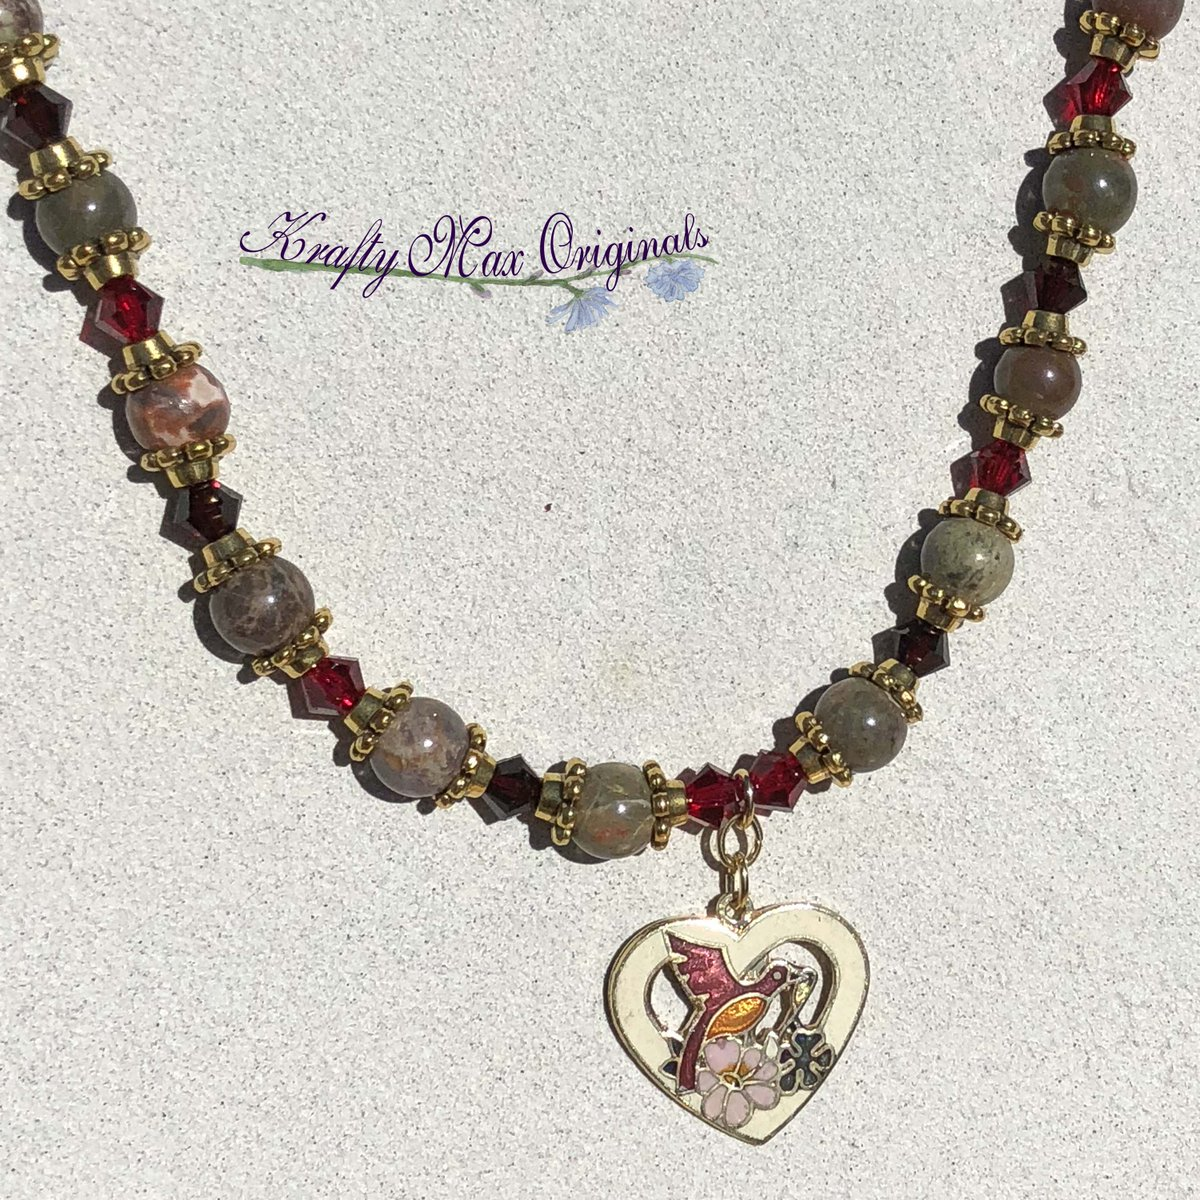 Red and Green Gemstone and Swarovski Crystal Necklace Set with Cloisonné Heart with Bird $48  #handmade #jewelry #supporthandmade #buyhandmade #handmadelove #jewelrydesigner #jewelryart #uniquejewelry #handcrafted #kraftymax #kmax